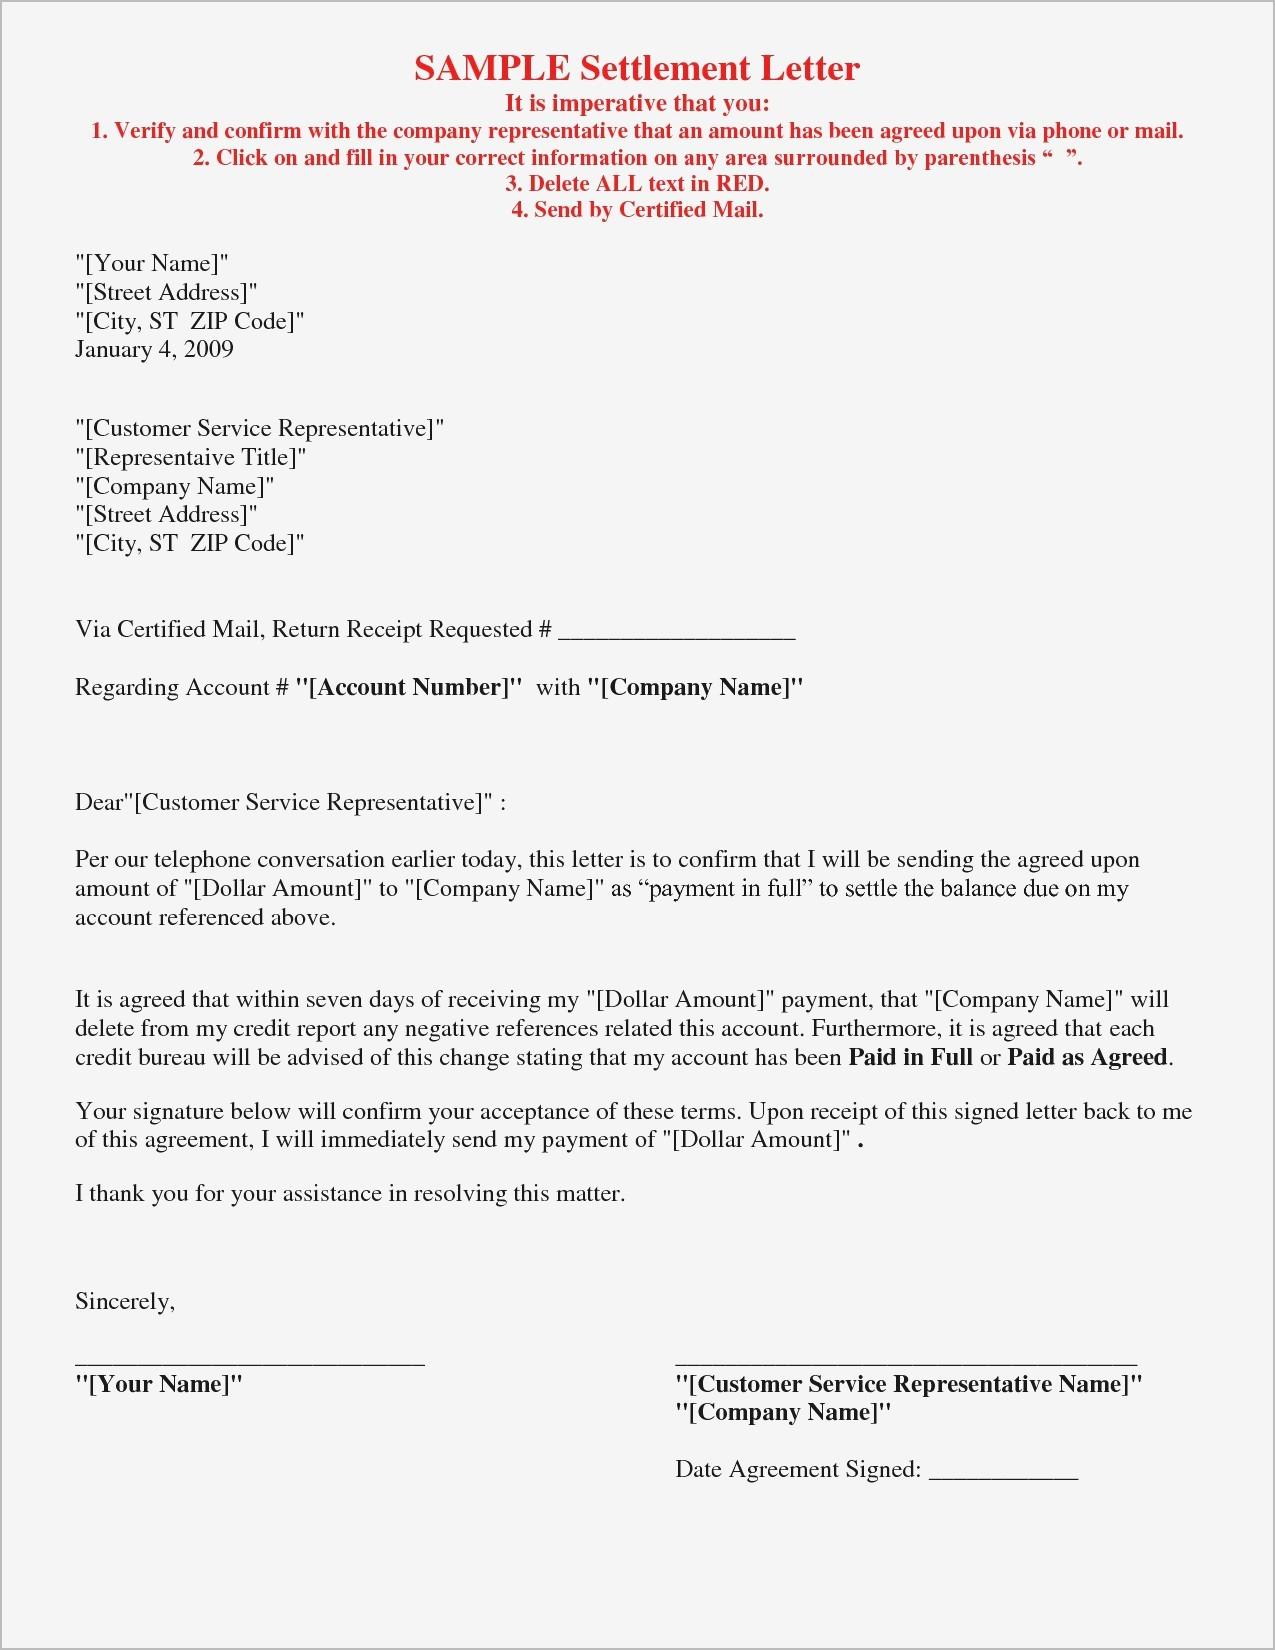 Credit Card Settlement Letter Template - Debt Negotiation Letter Template